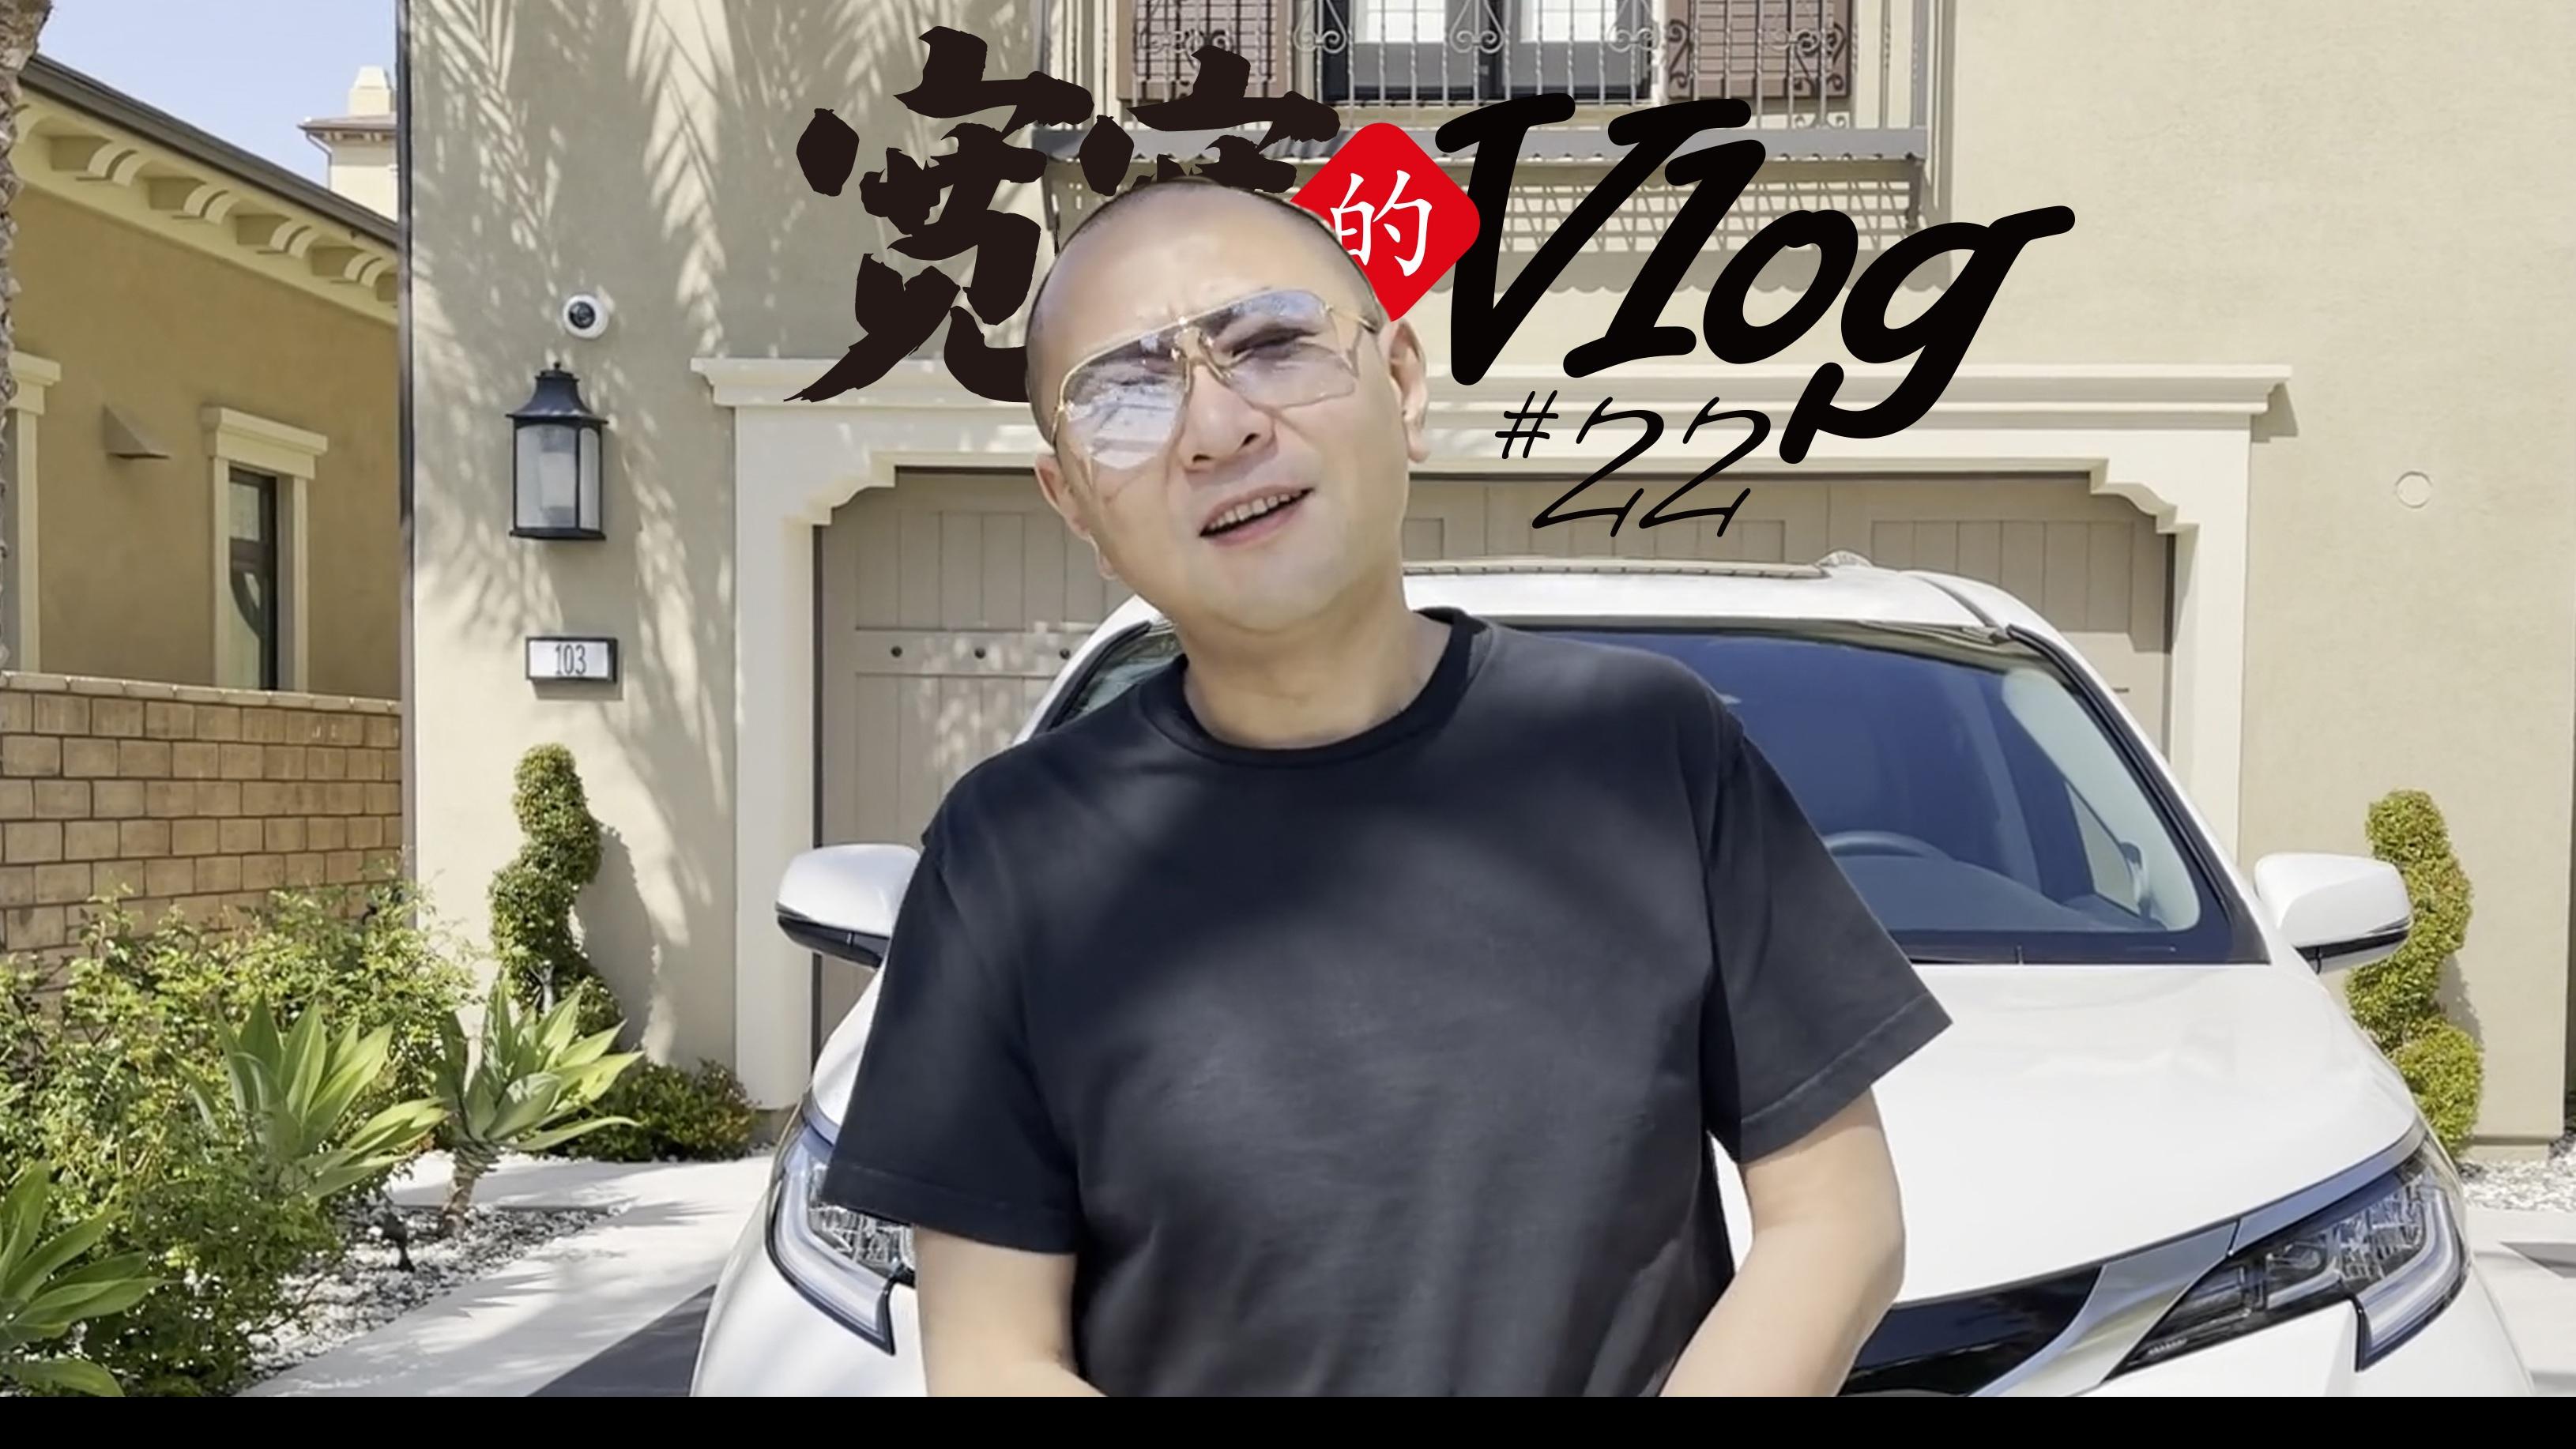 SCC宽宽VLOG#022 2021款丰田塞纳值得拥有吗?视频